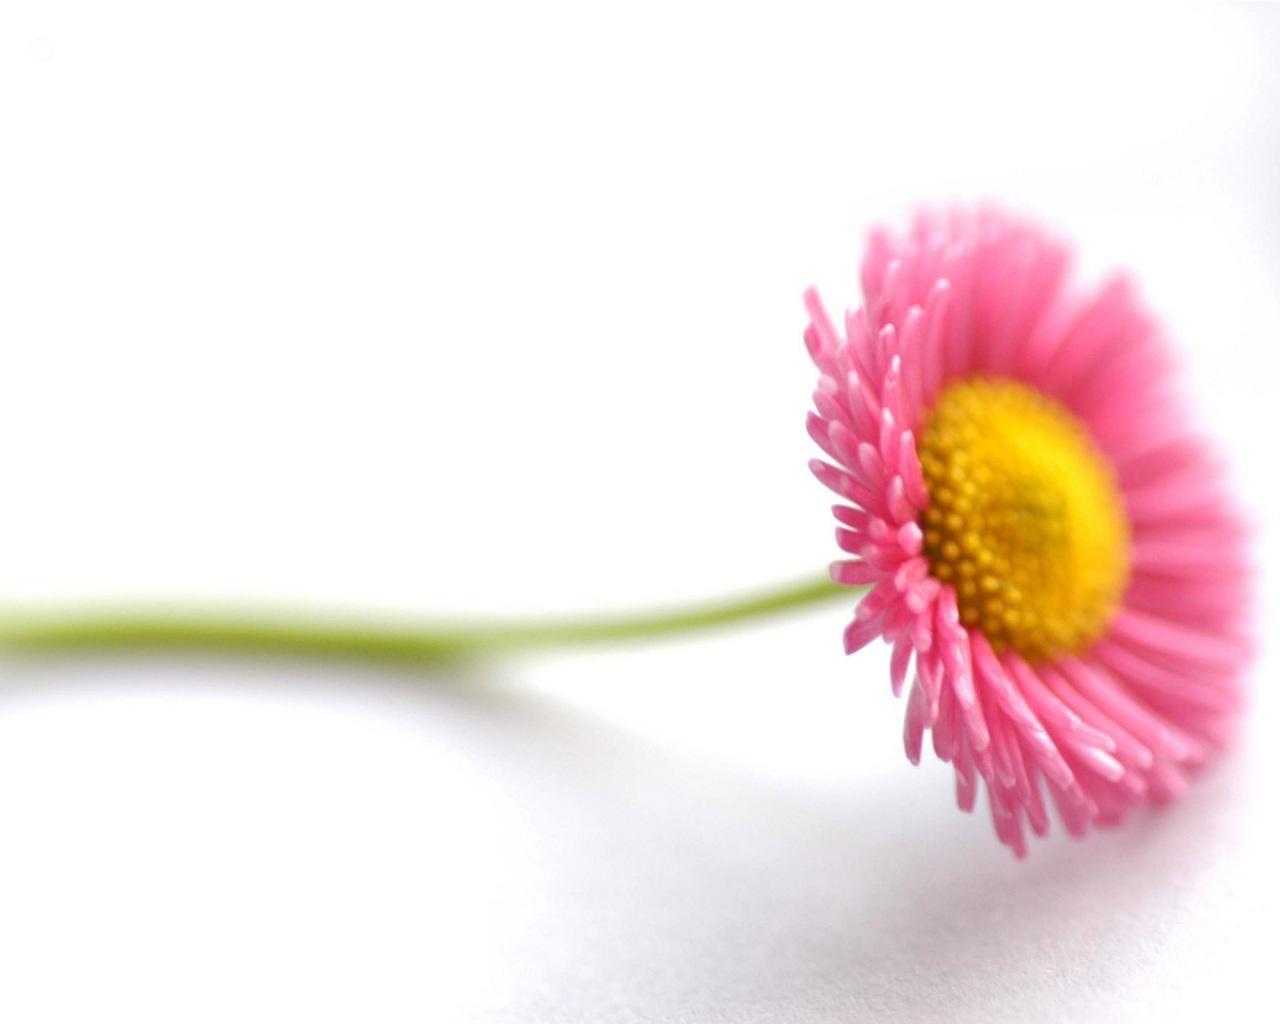 Flower Widescreen Desktop Pc Wallpapers Download Wallpaper 1280x1024